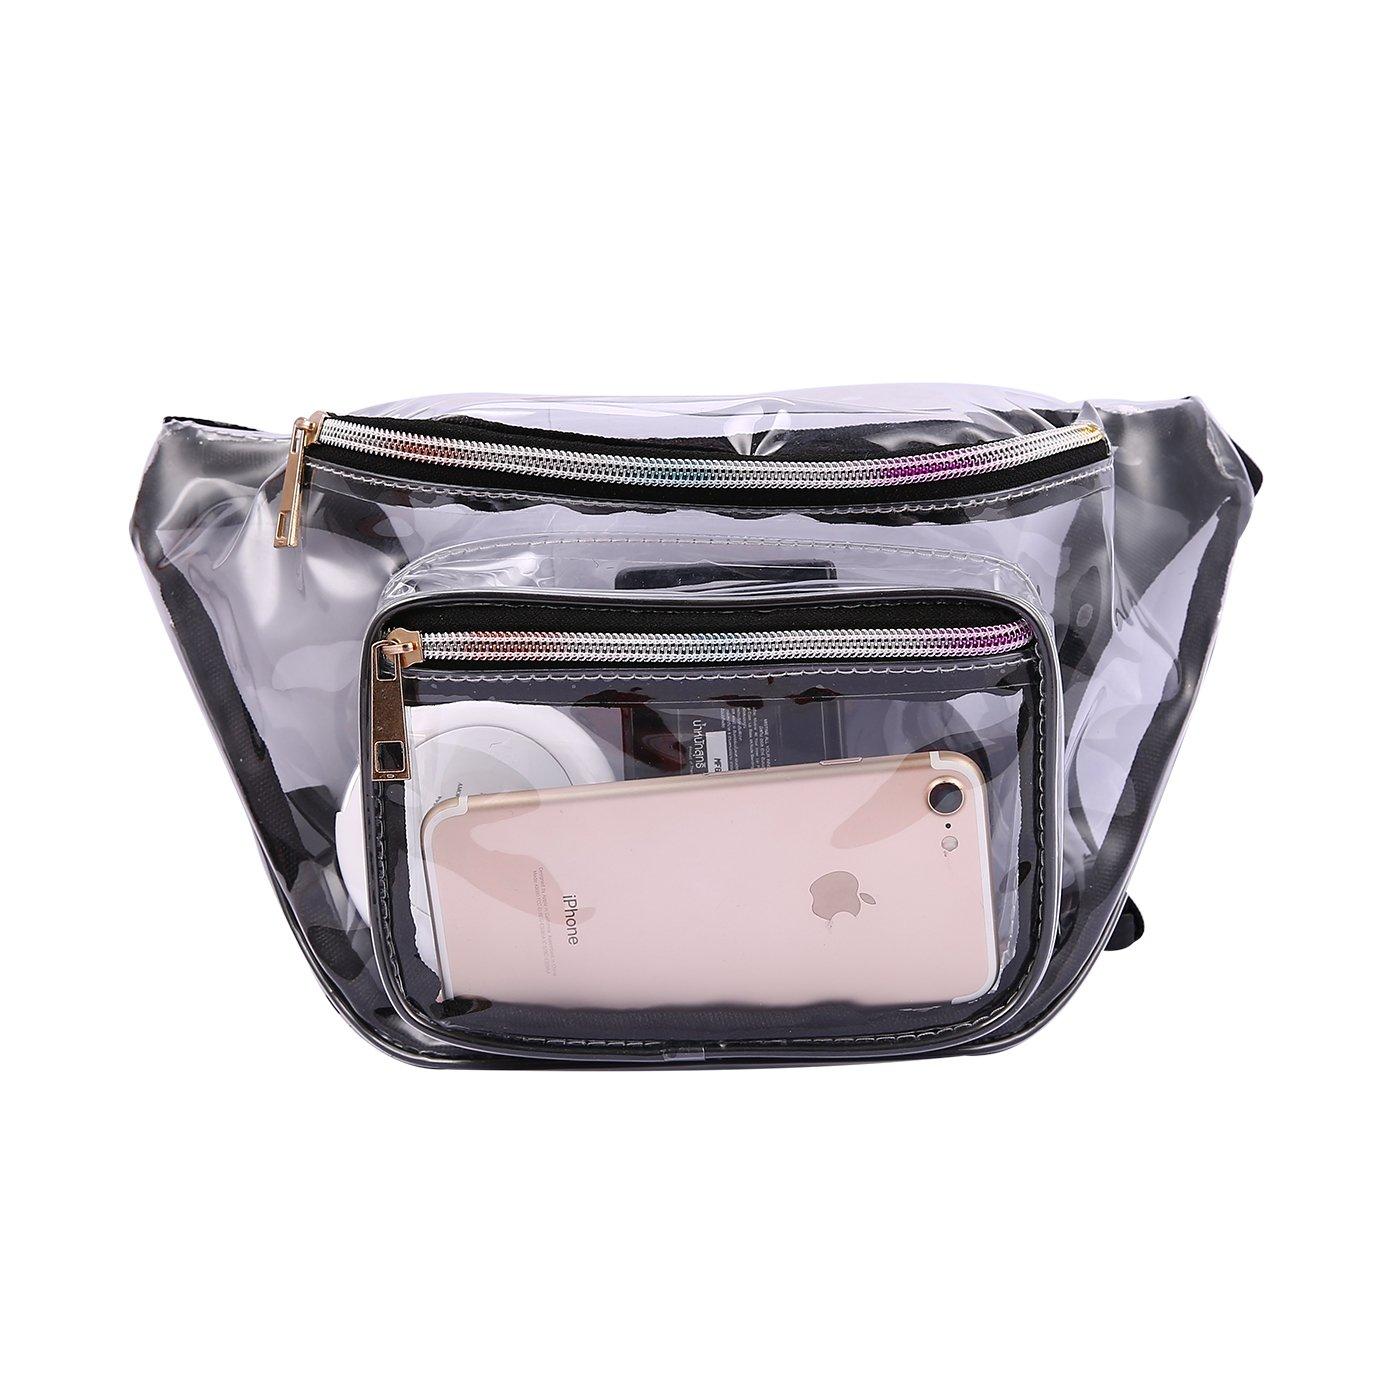 HDE Shiny Retro Fanny Pack Rave Festival Hologram Waist Pack Bum Bag Outdoor Travel Crossbody Hip Bag (Clear)